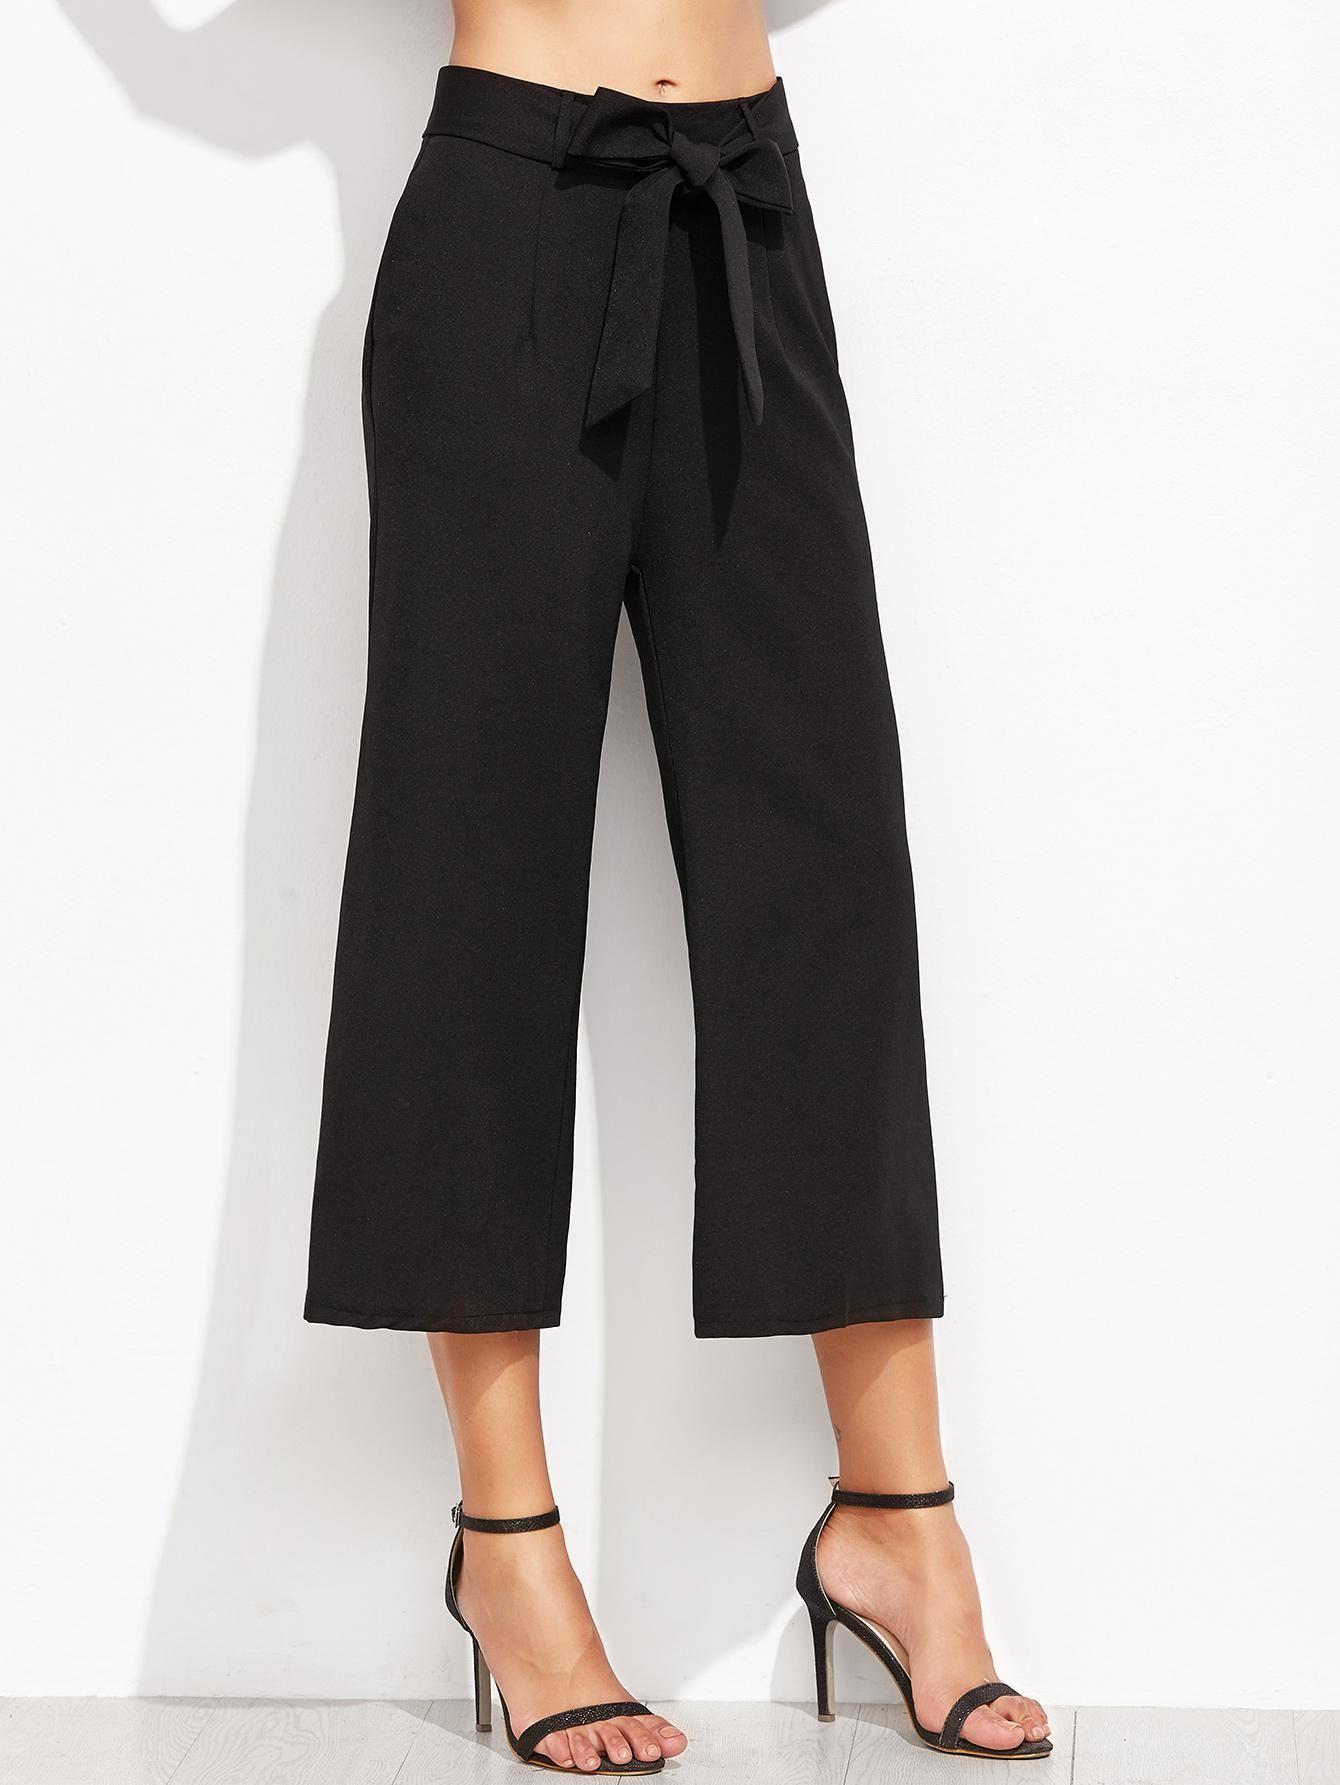 ROMWE - ROMWE Black Self Tie Wide Leg Pants - AdoreWe.com